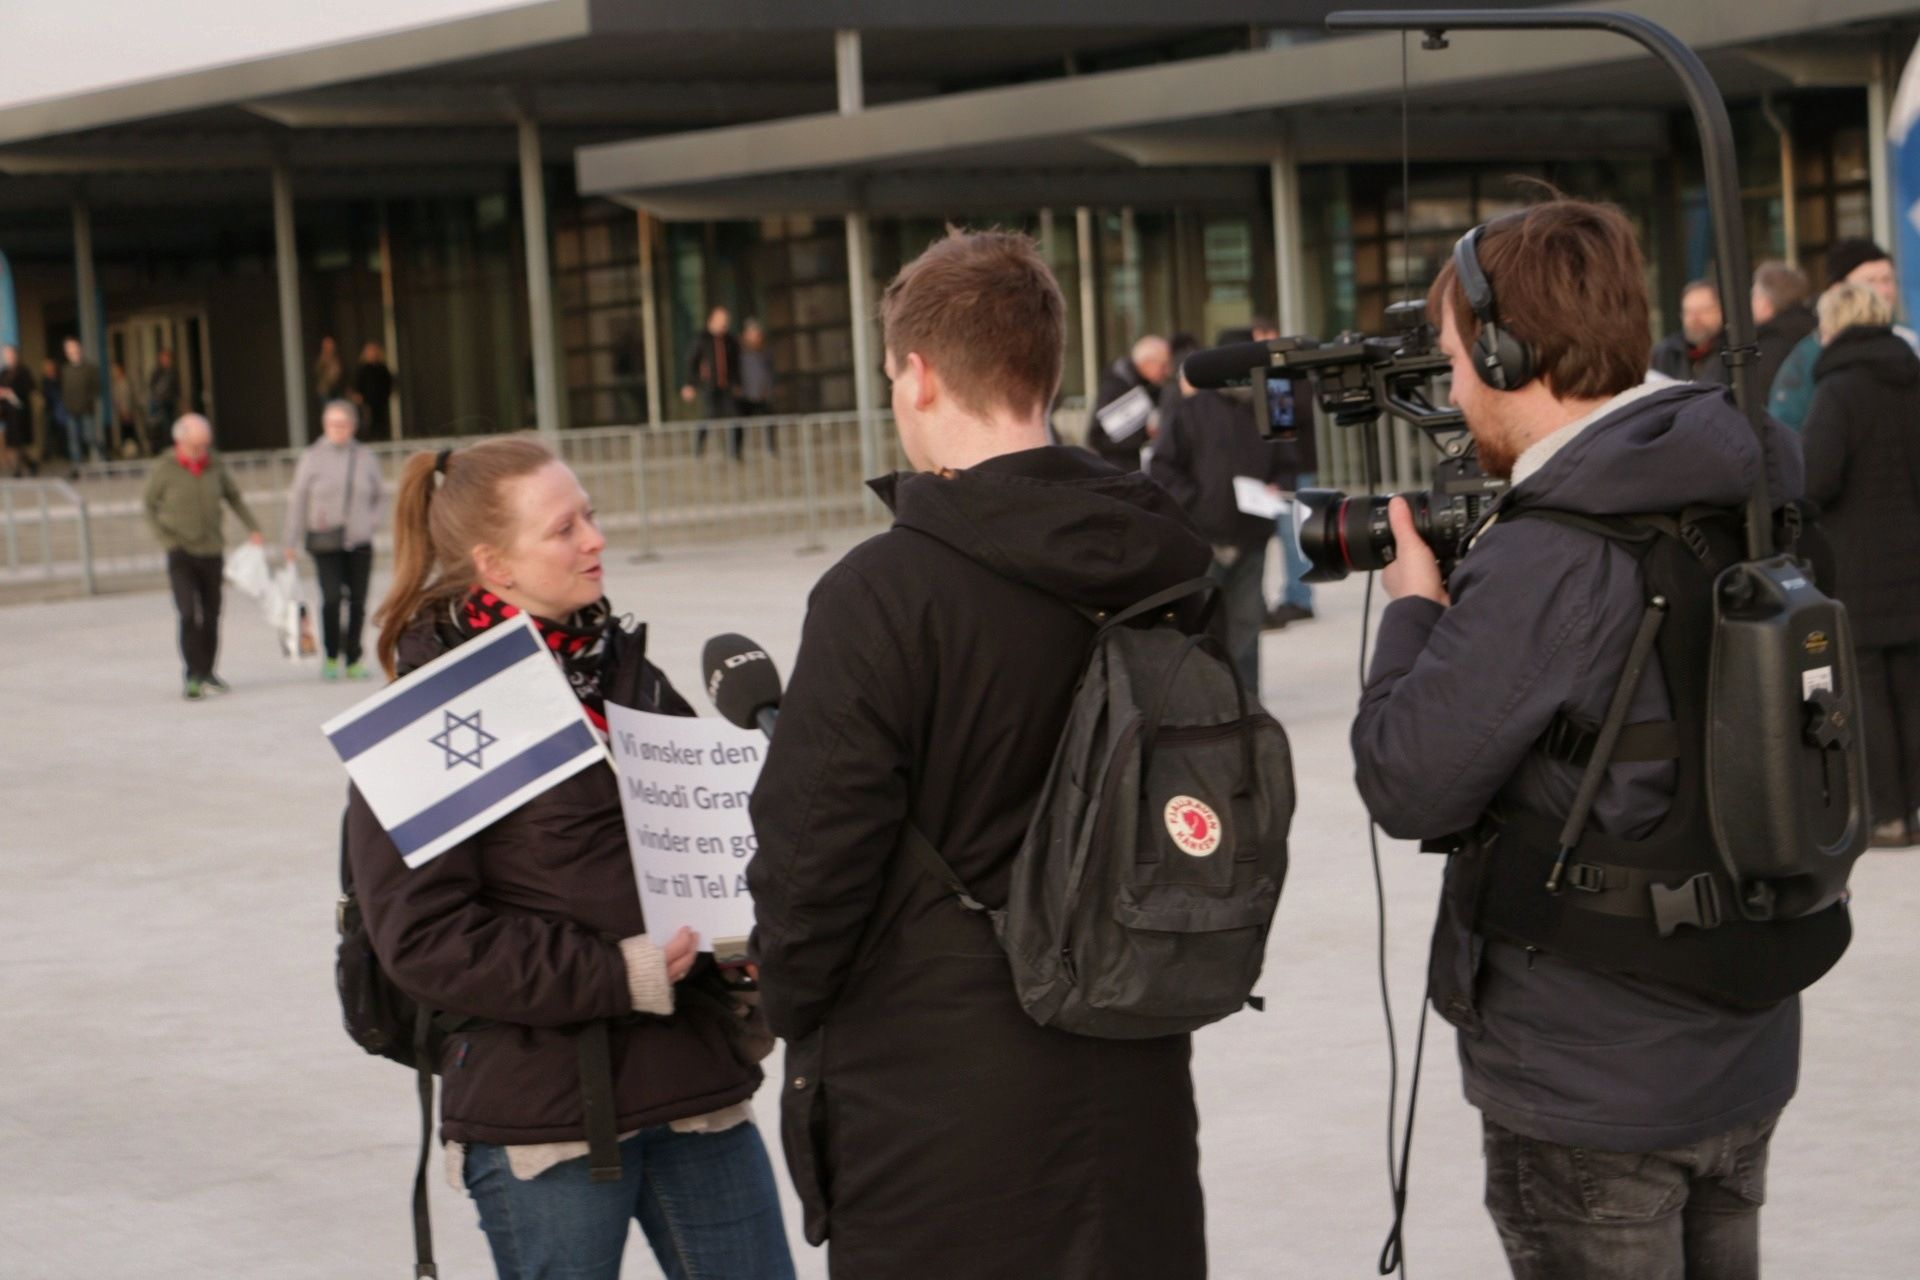 Danmarks Radio interviewer een pro-Israel demonstrant (privat foto: Simeon Kristensen)